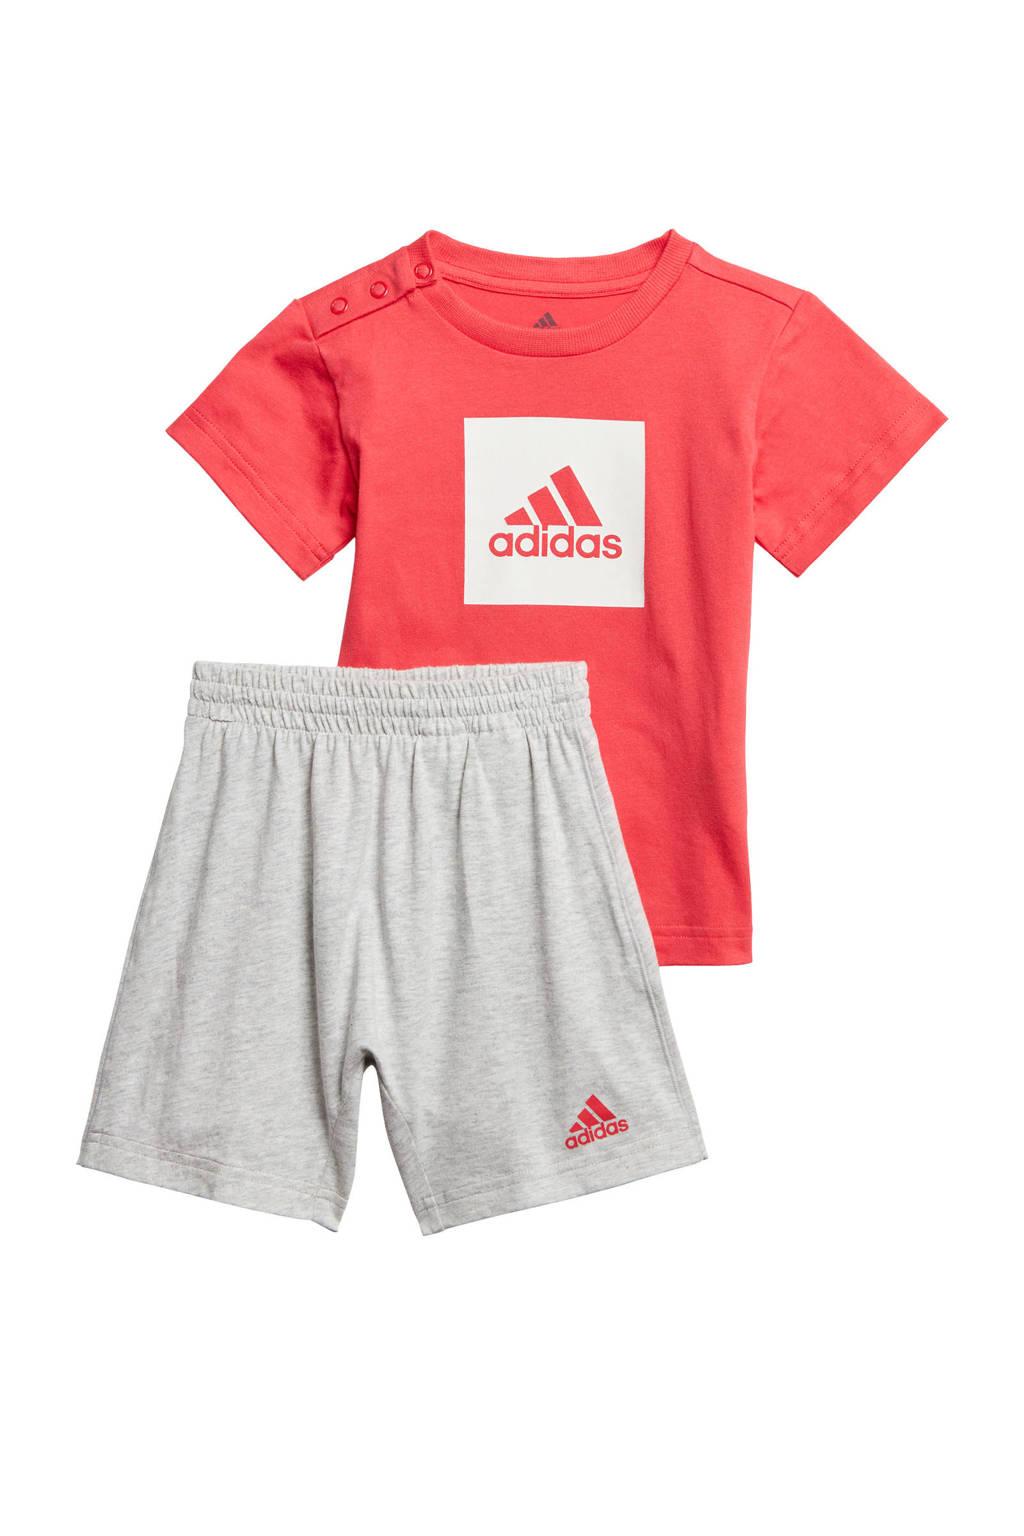 adidas Performance   sportset rood/lichtgrijs, Rood/lichtgrijs